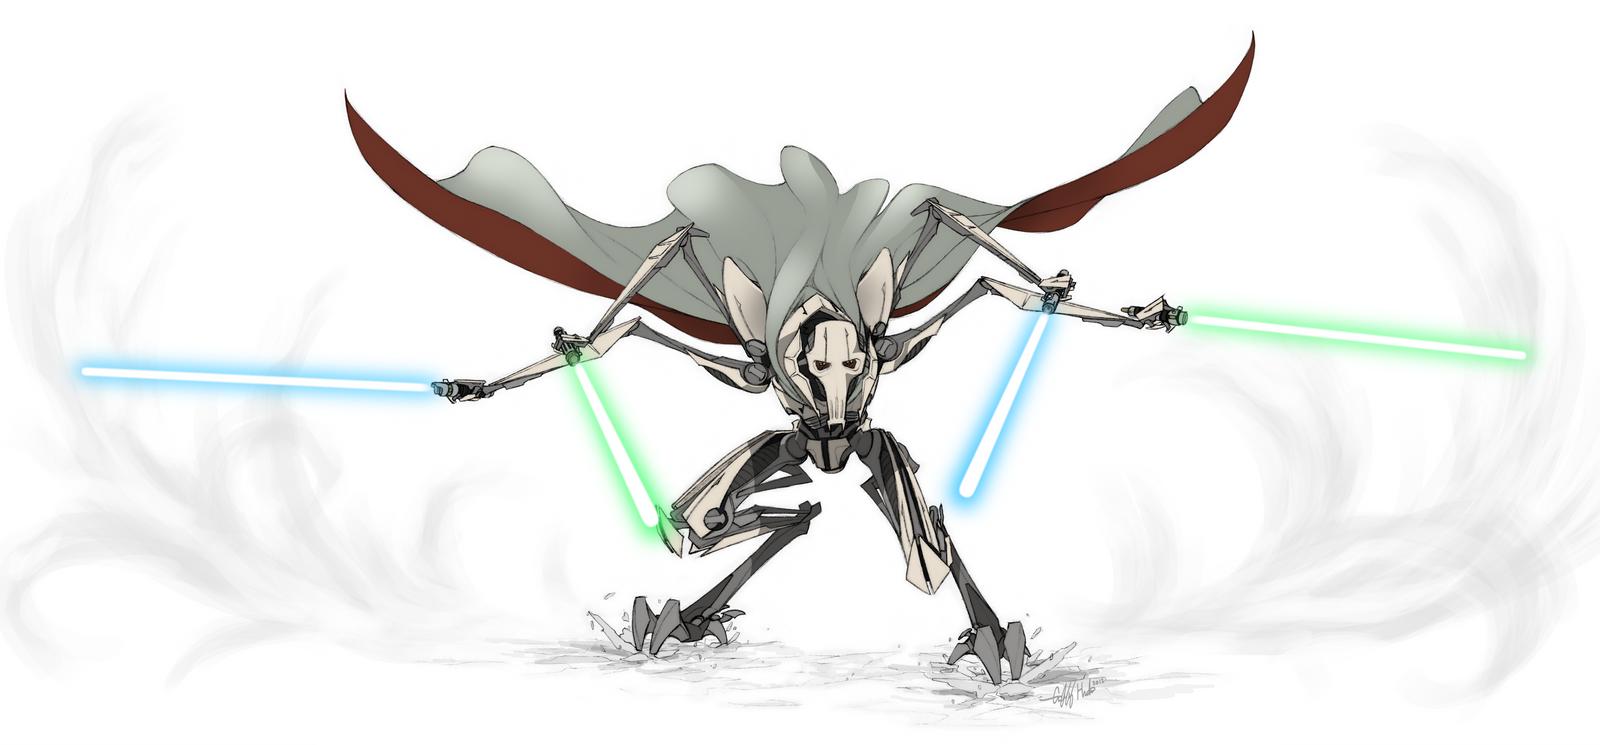 The Droid General by Tekka-Croe